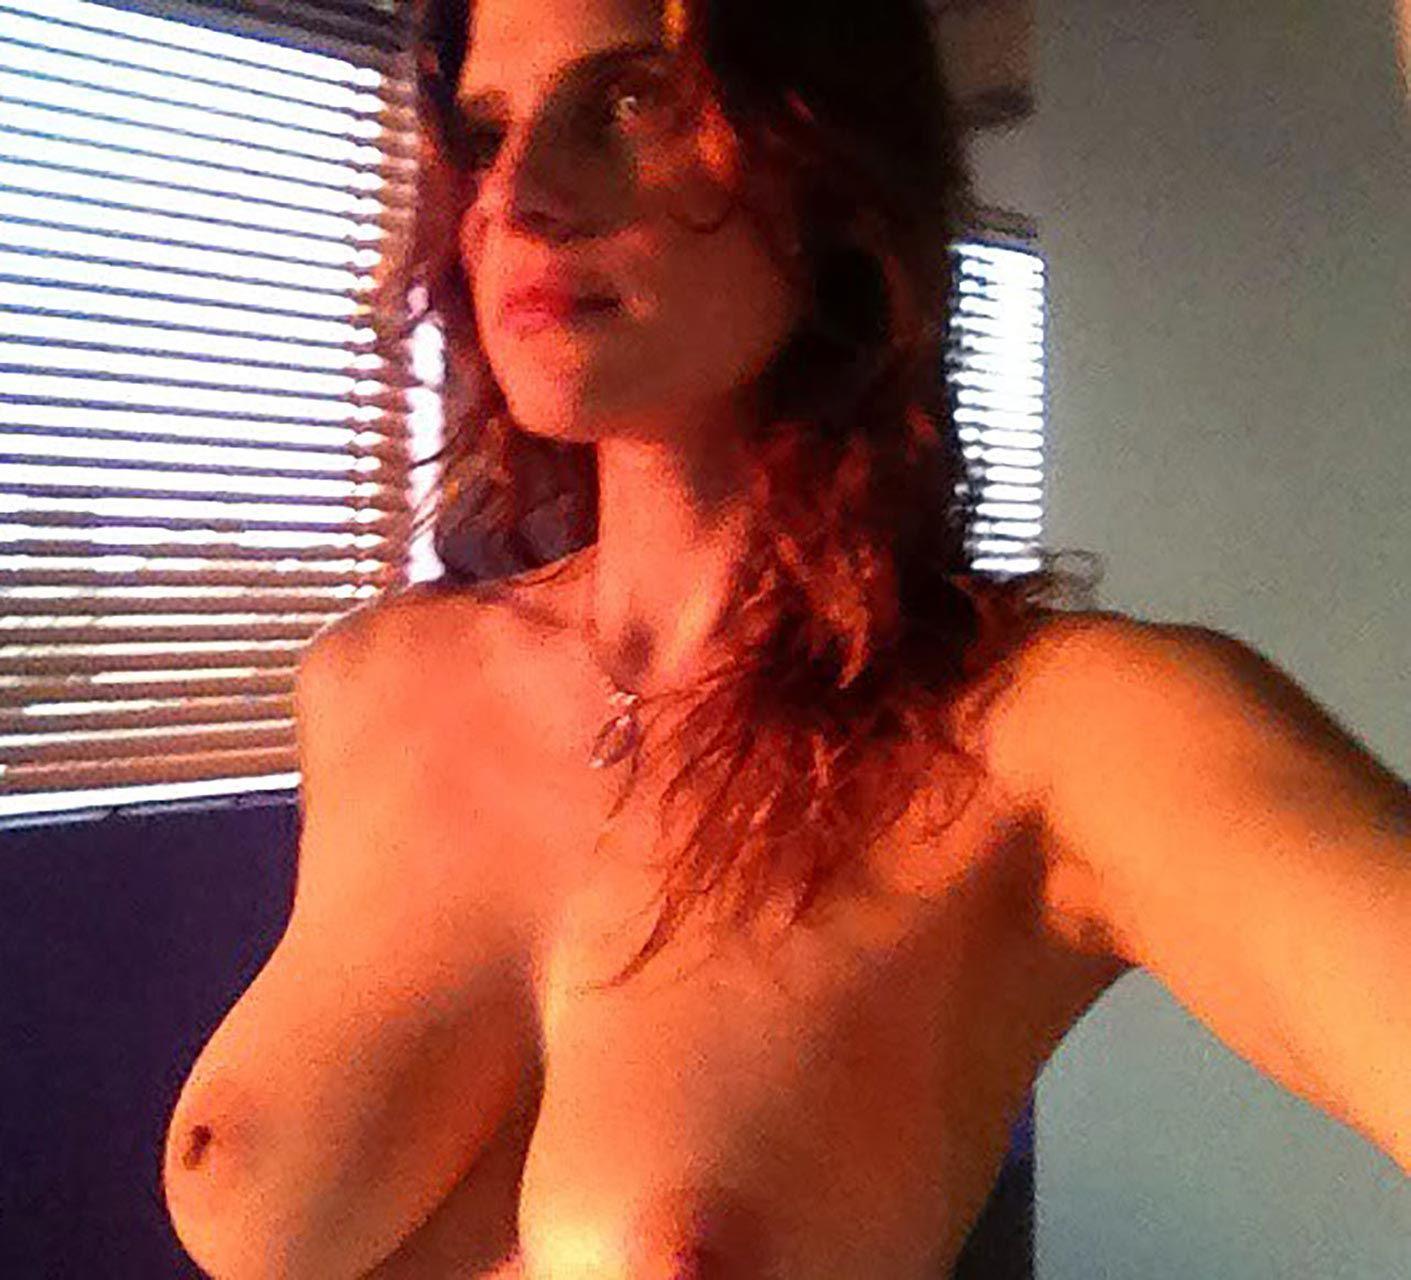 Lake Bell Nude Leaked (2)